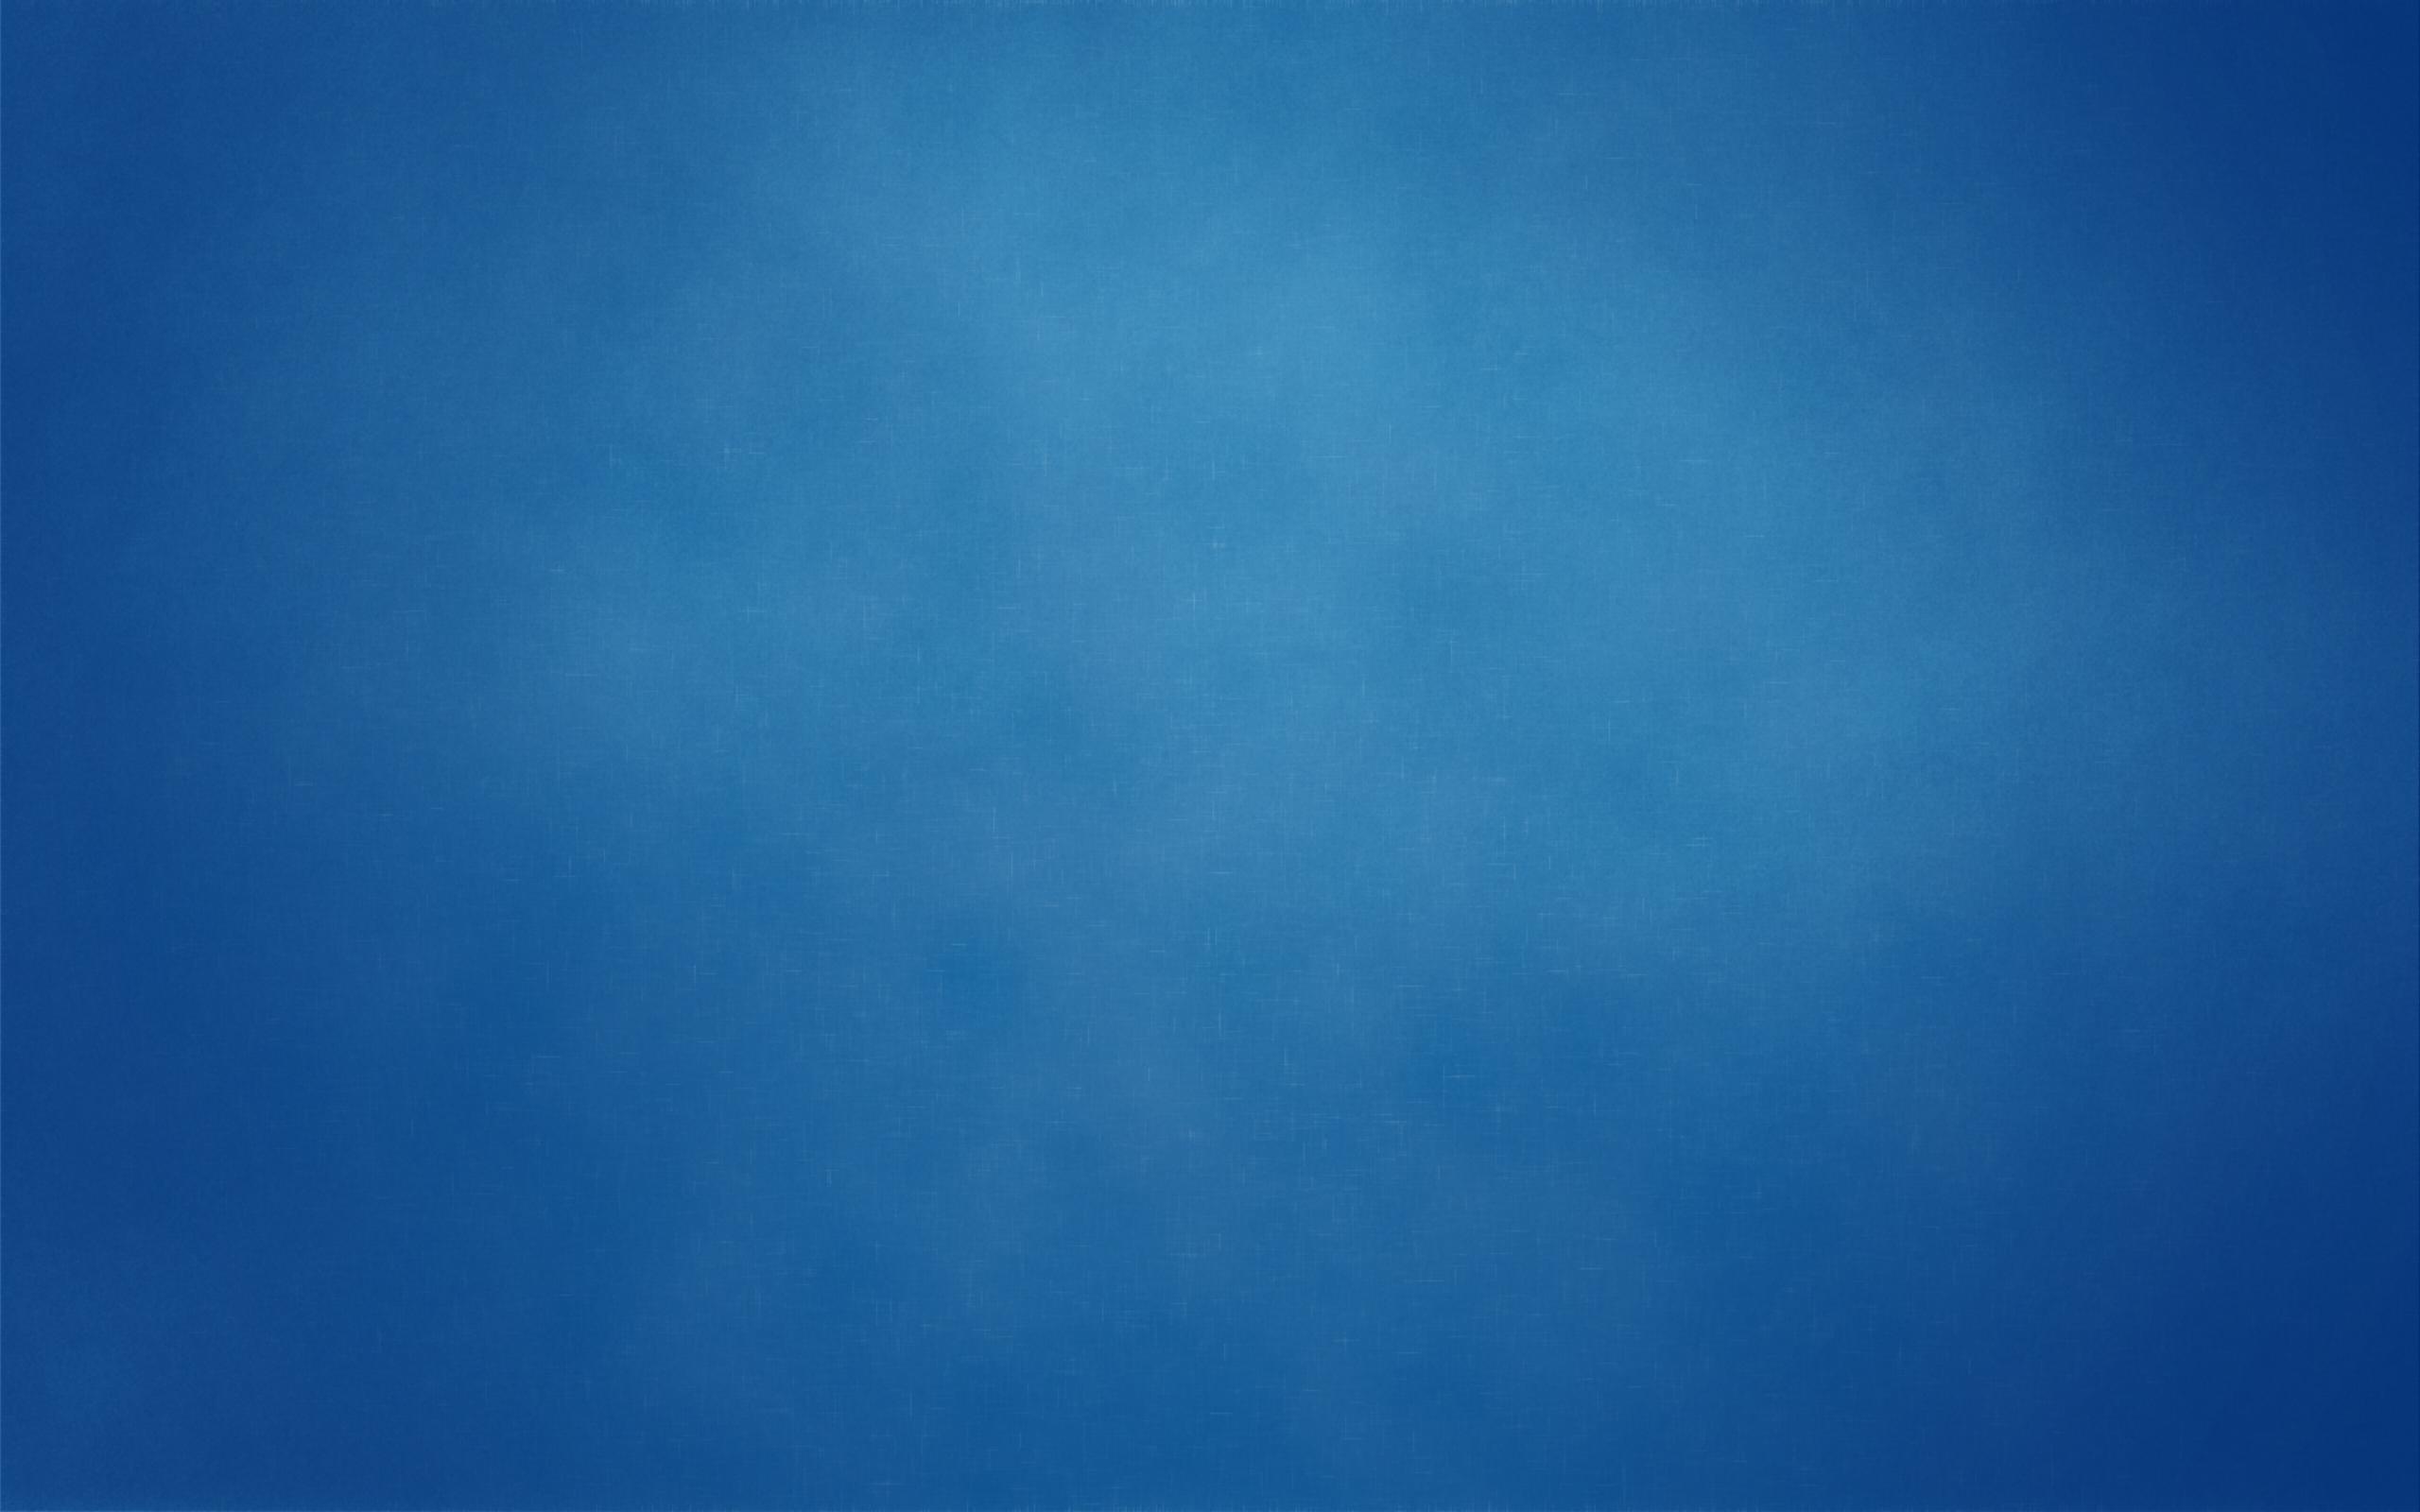 Download Navy Blue Wallpapers Wallpapercraft 2560x1600